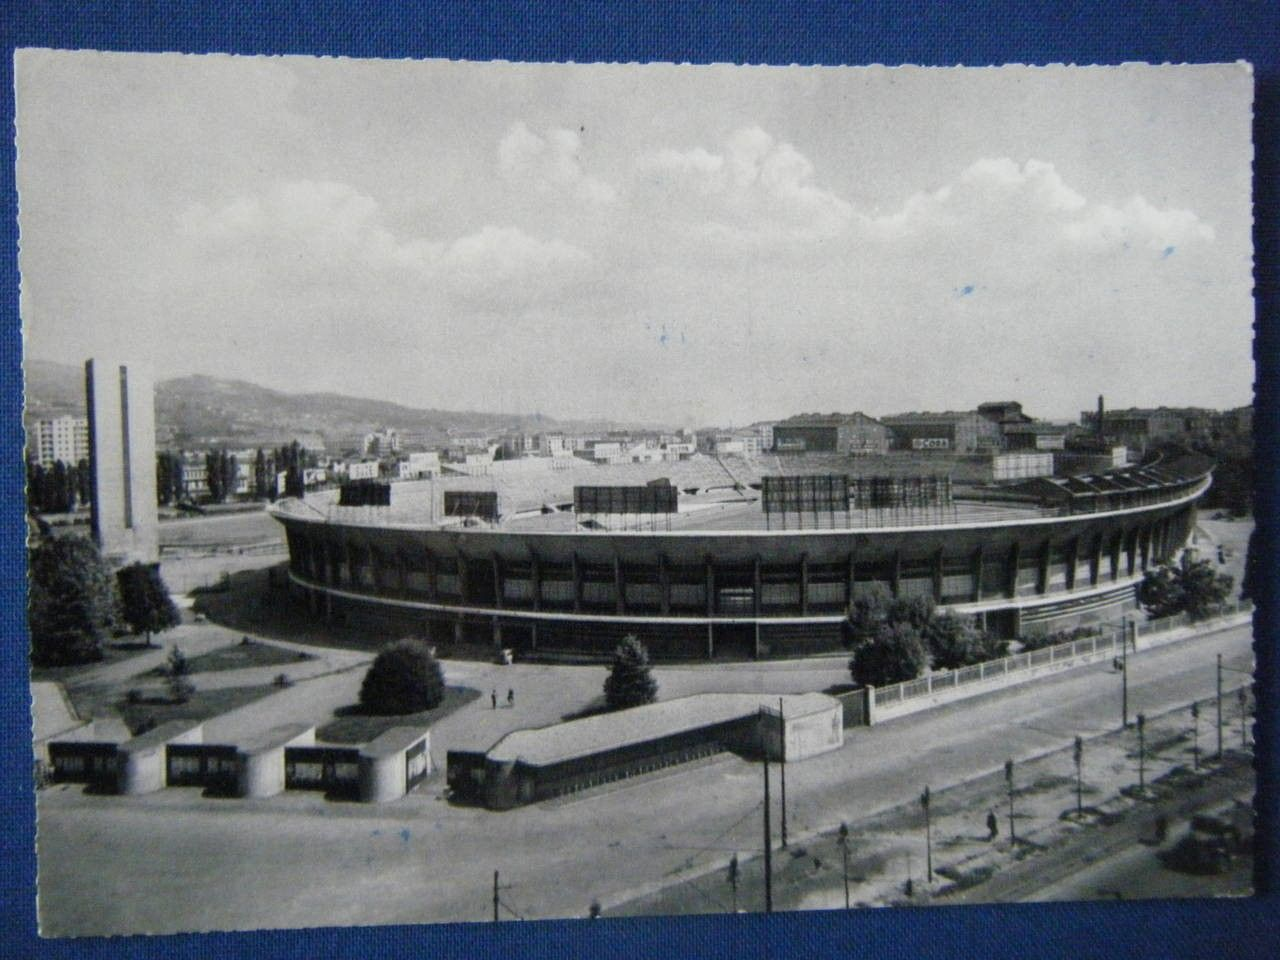 «Коммунале», Италия 1932-1990 жылдар арасындағы Ювентус клубының алаңы